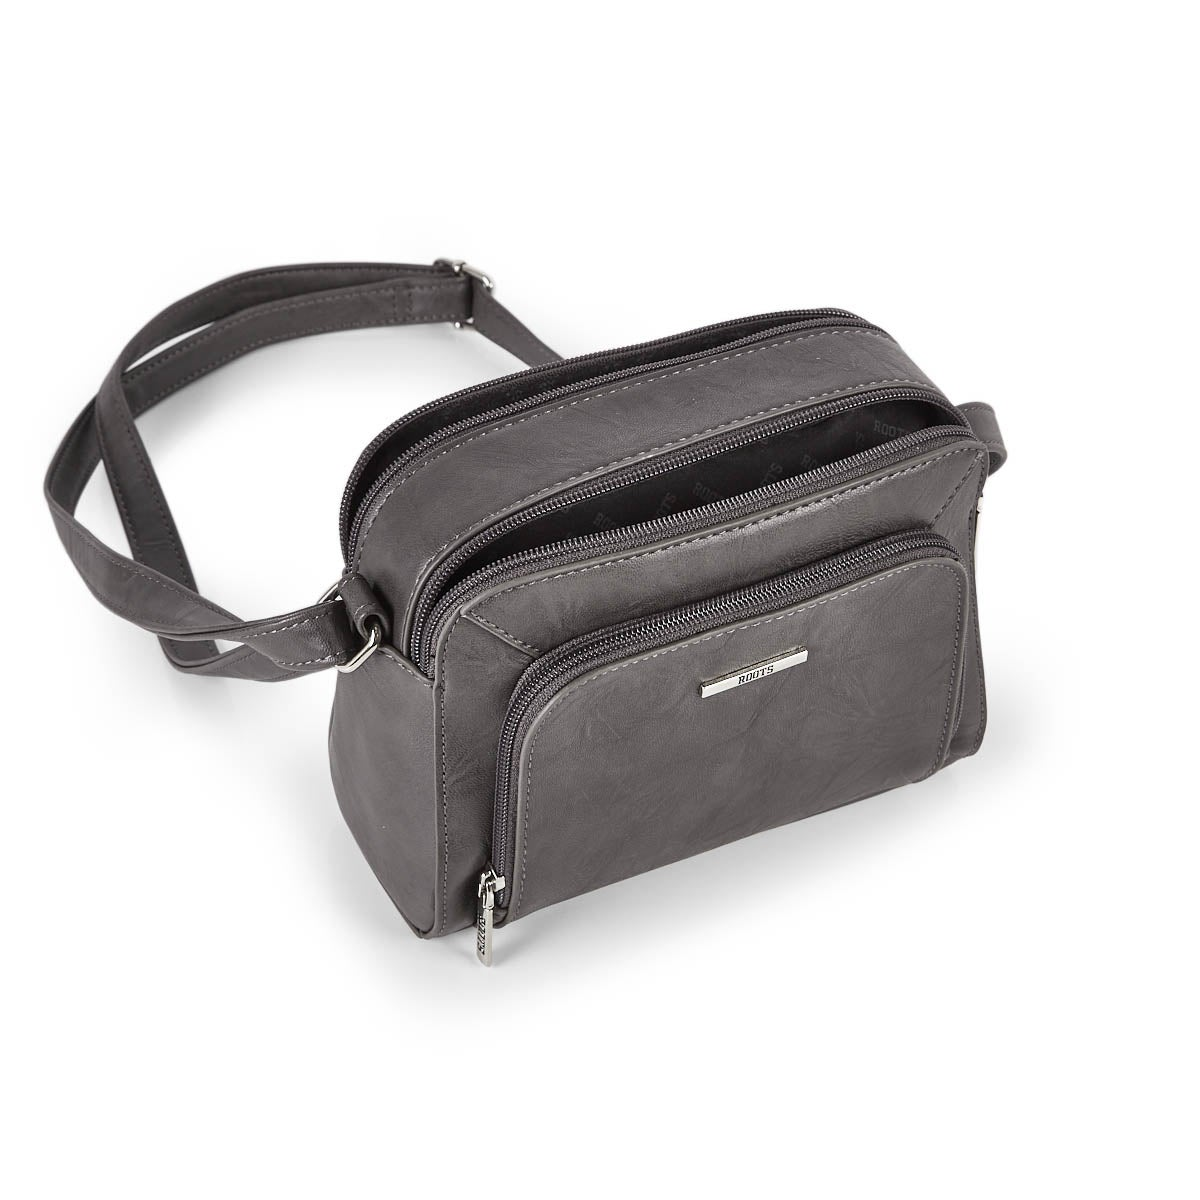 Lds Roots73 grey crossbody camera bag